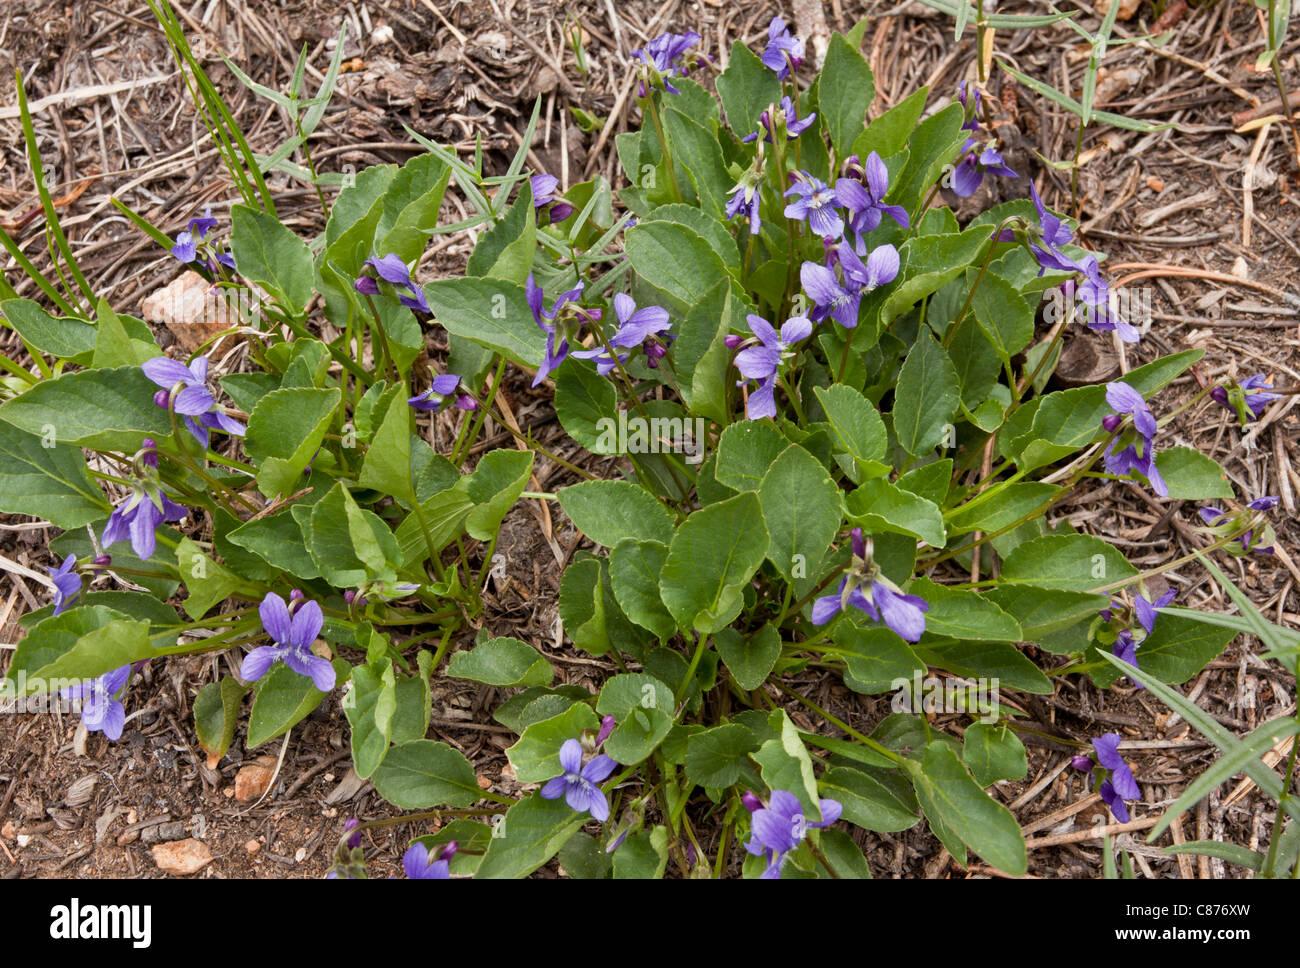 A violet, Viola adunca, on mount eddy, california - Stock Image